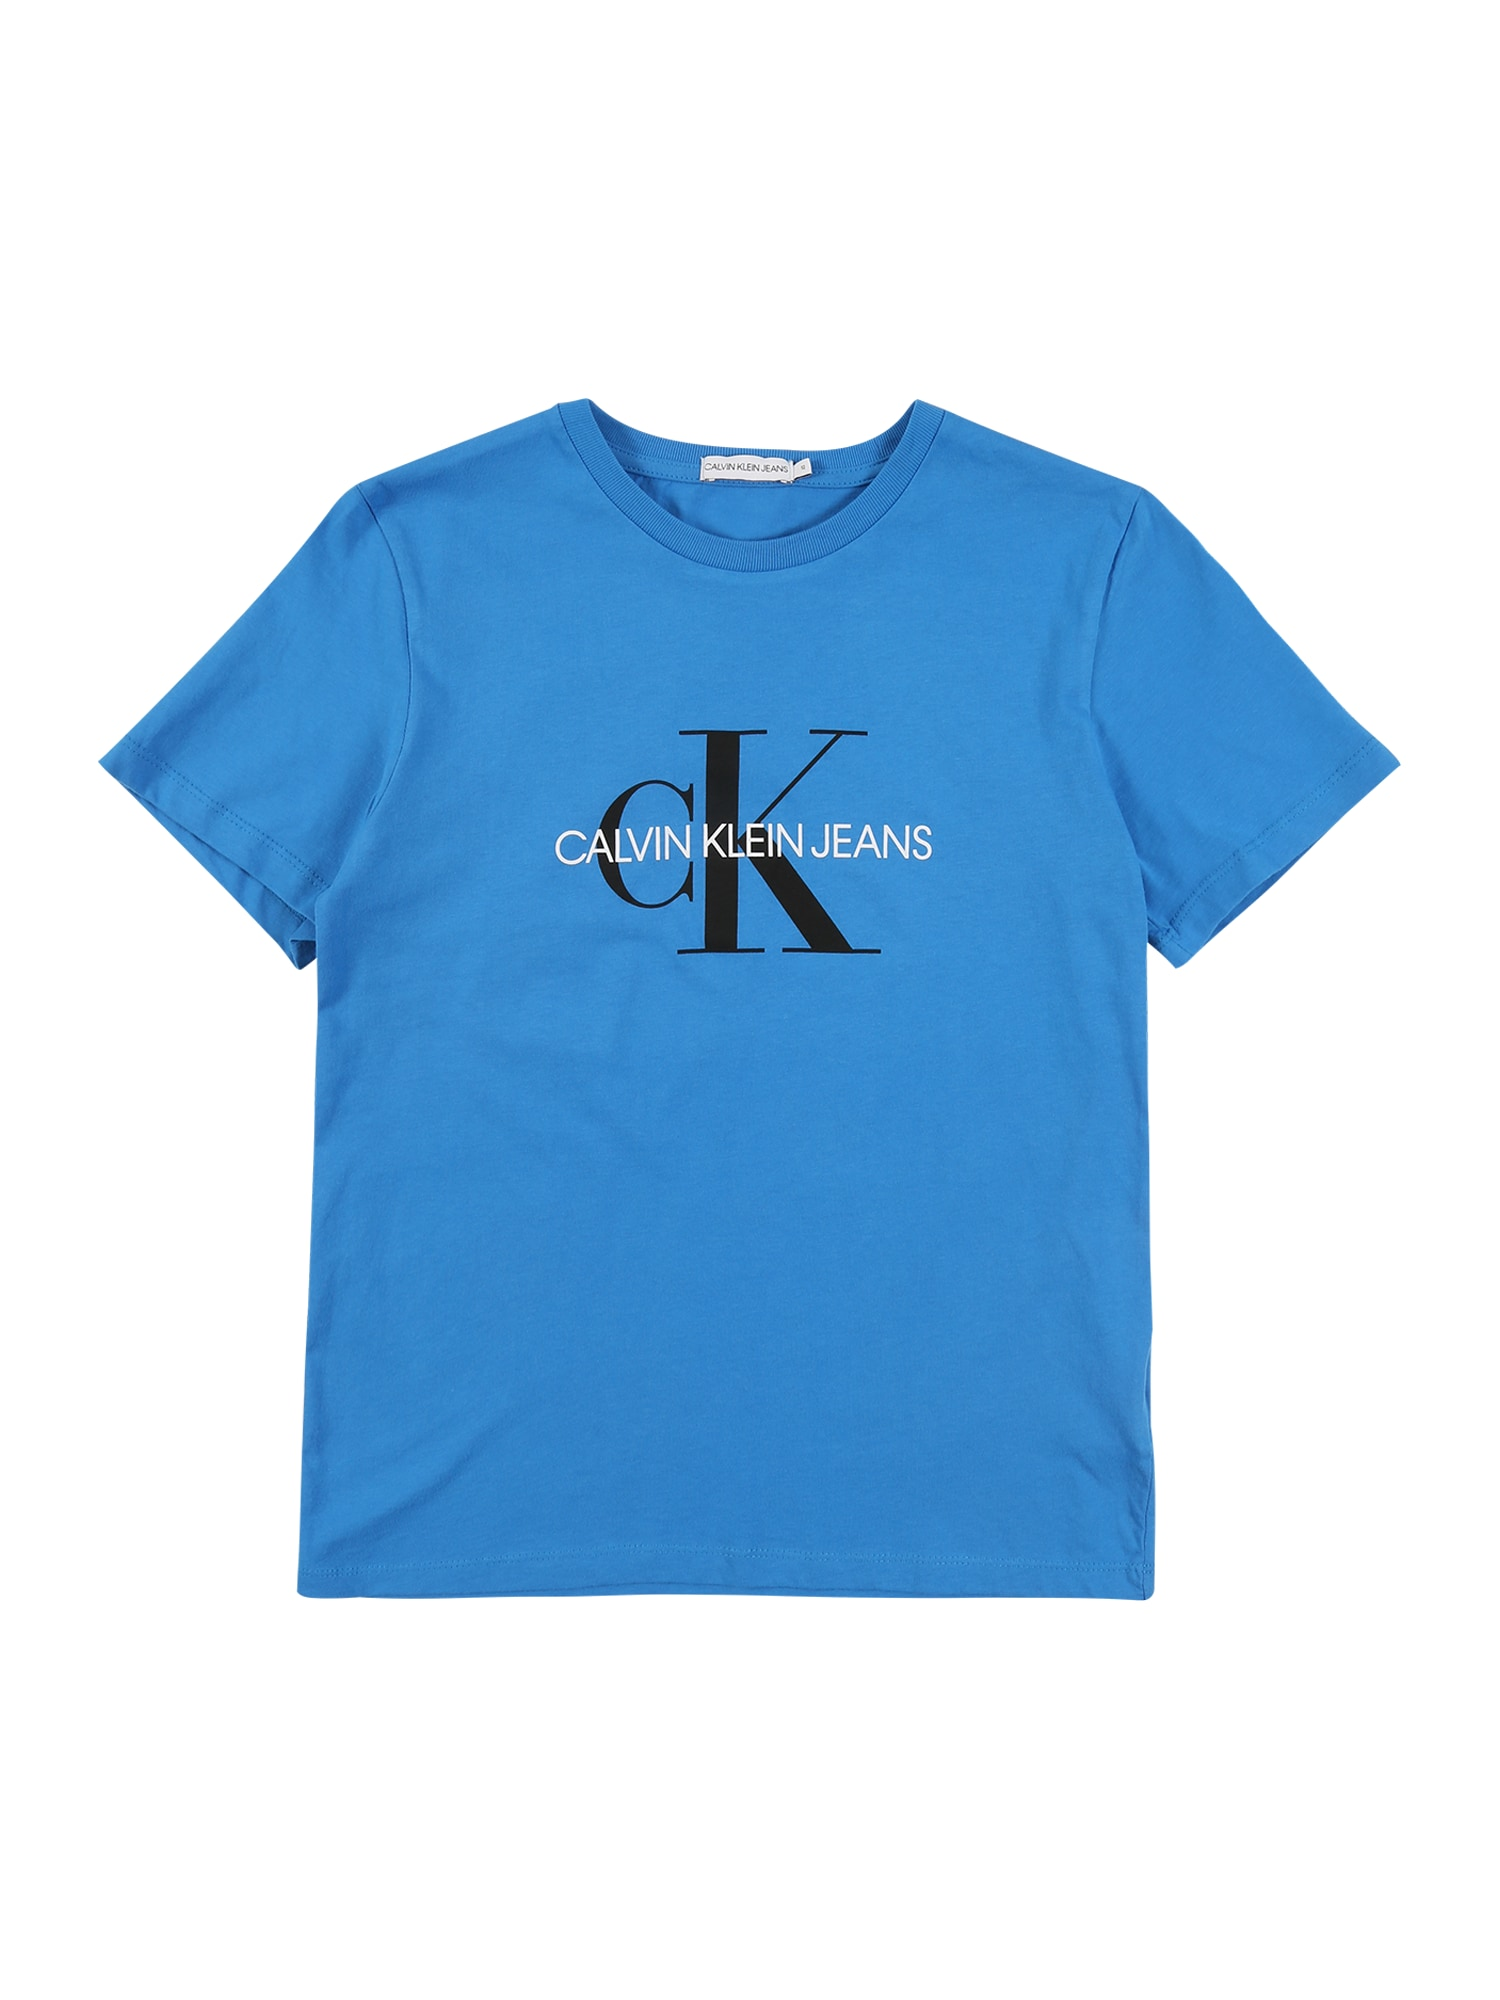 Calvin Klein Jeans Marškinėliai mėlyna